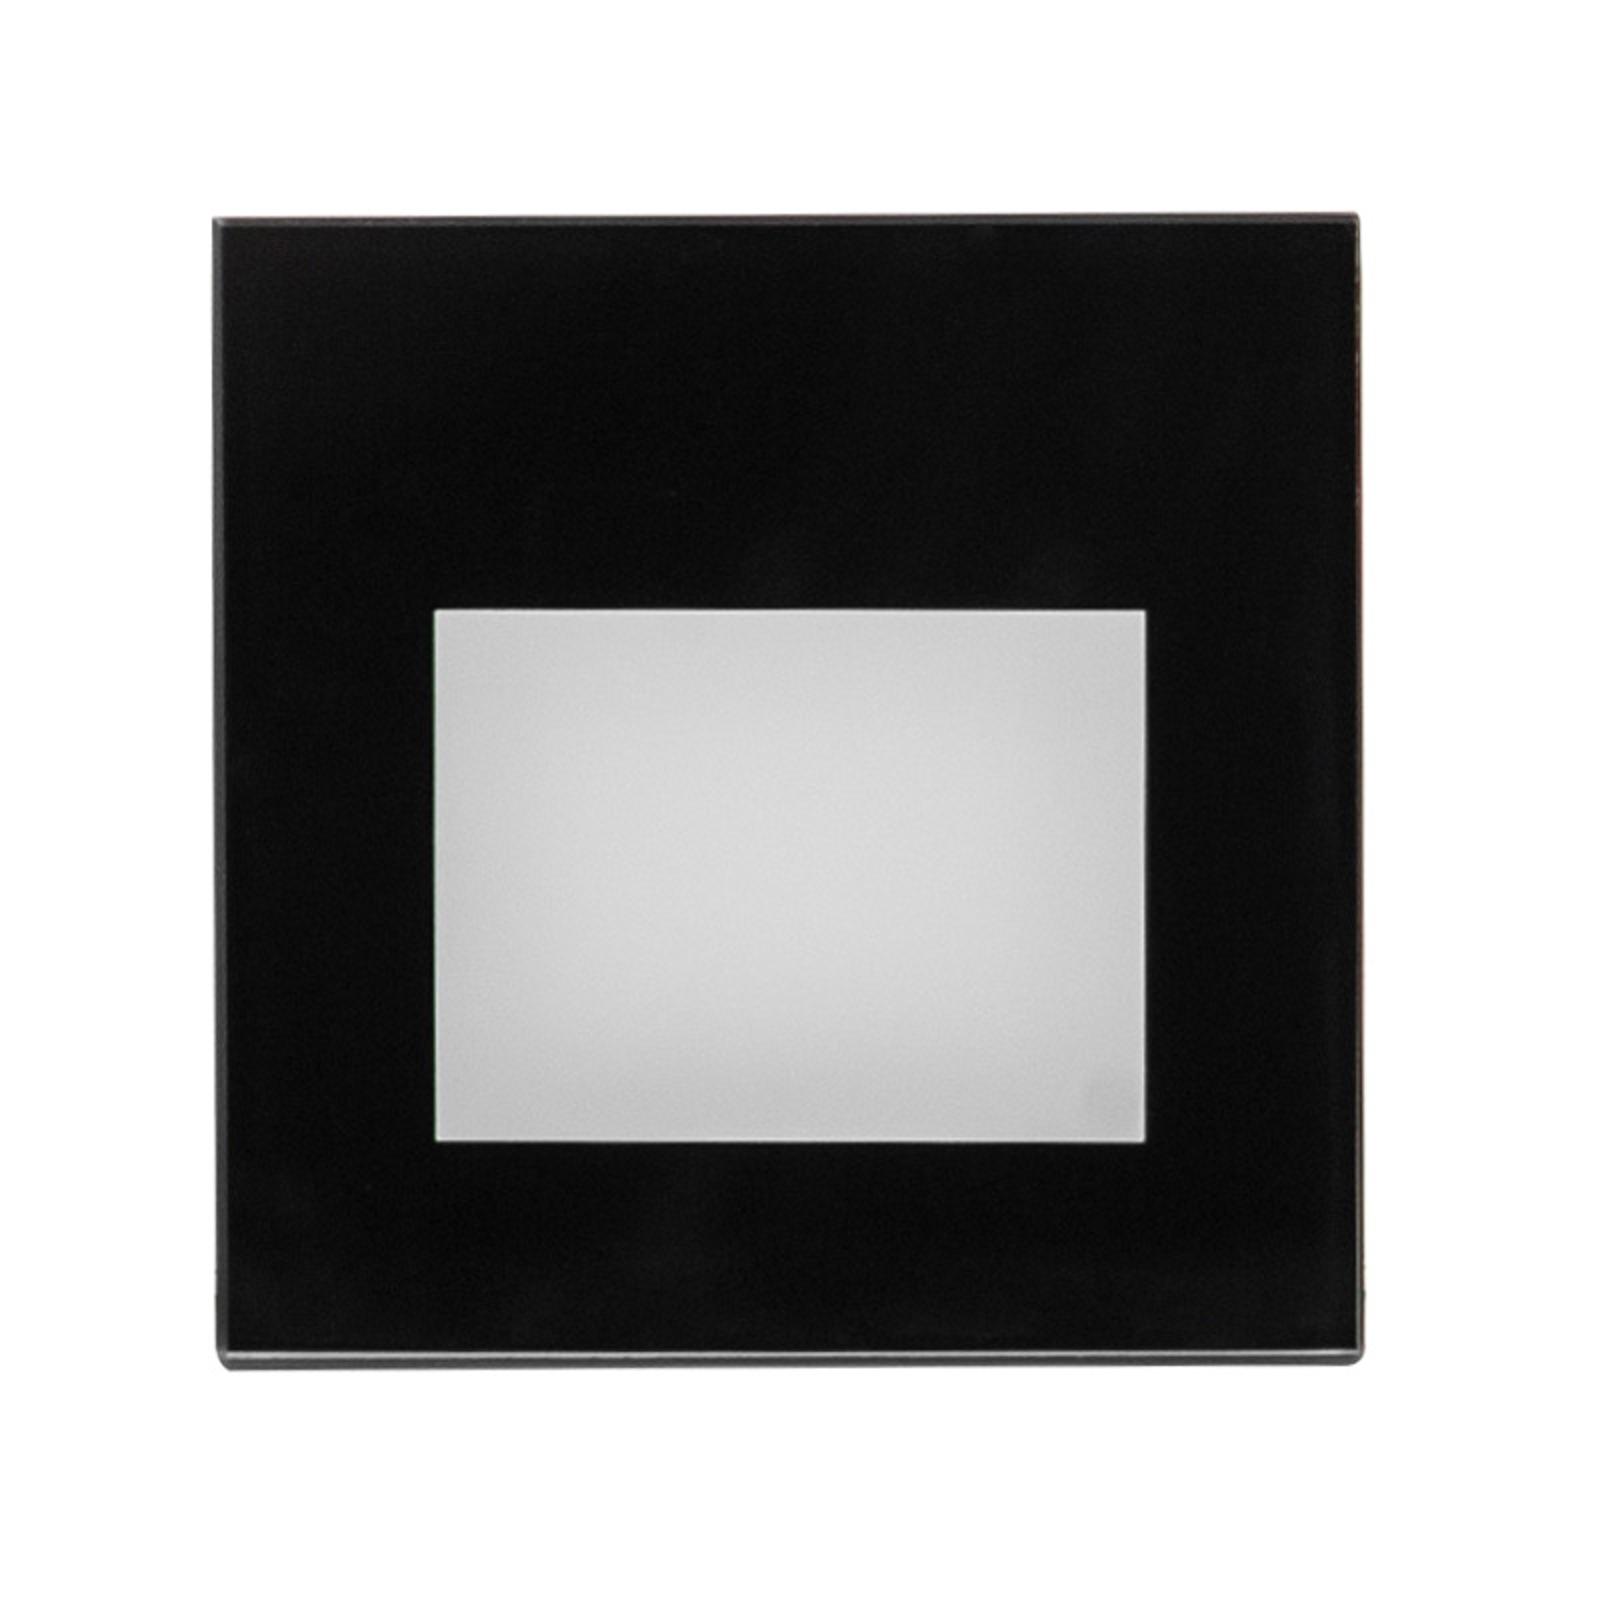 BRUMBERG Wall Kit68 Einbau flach eckig schwarz